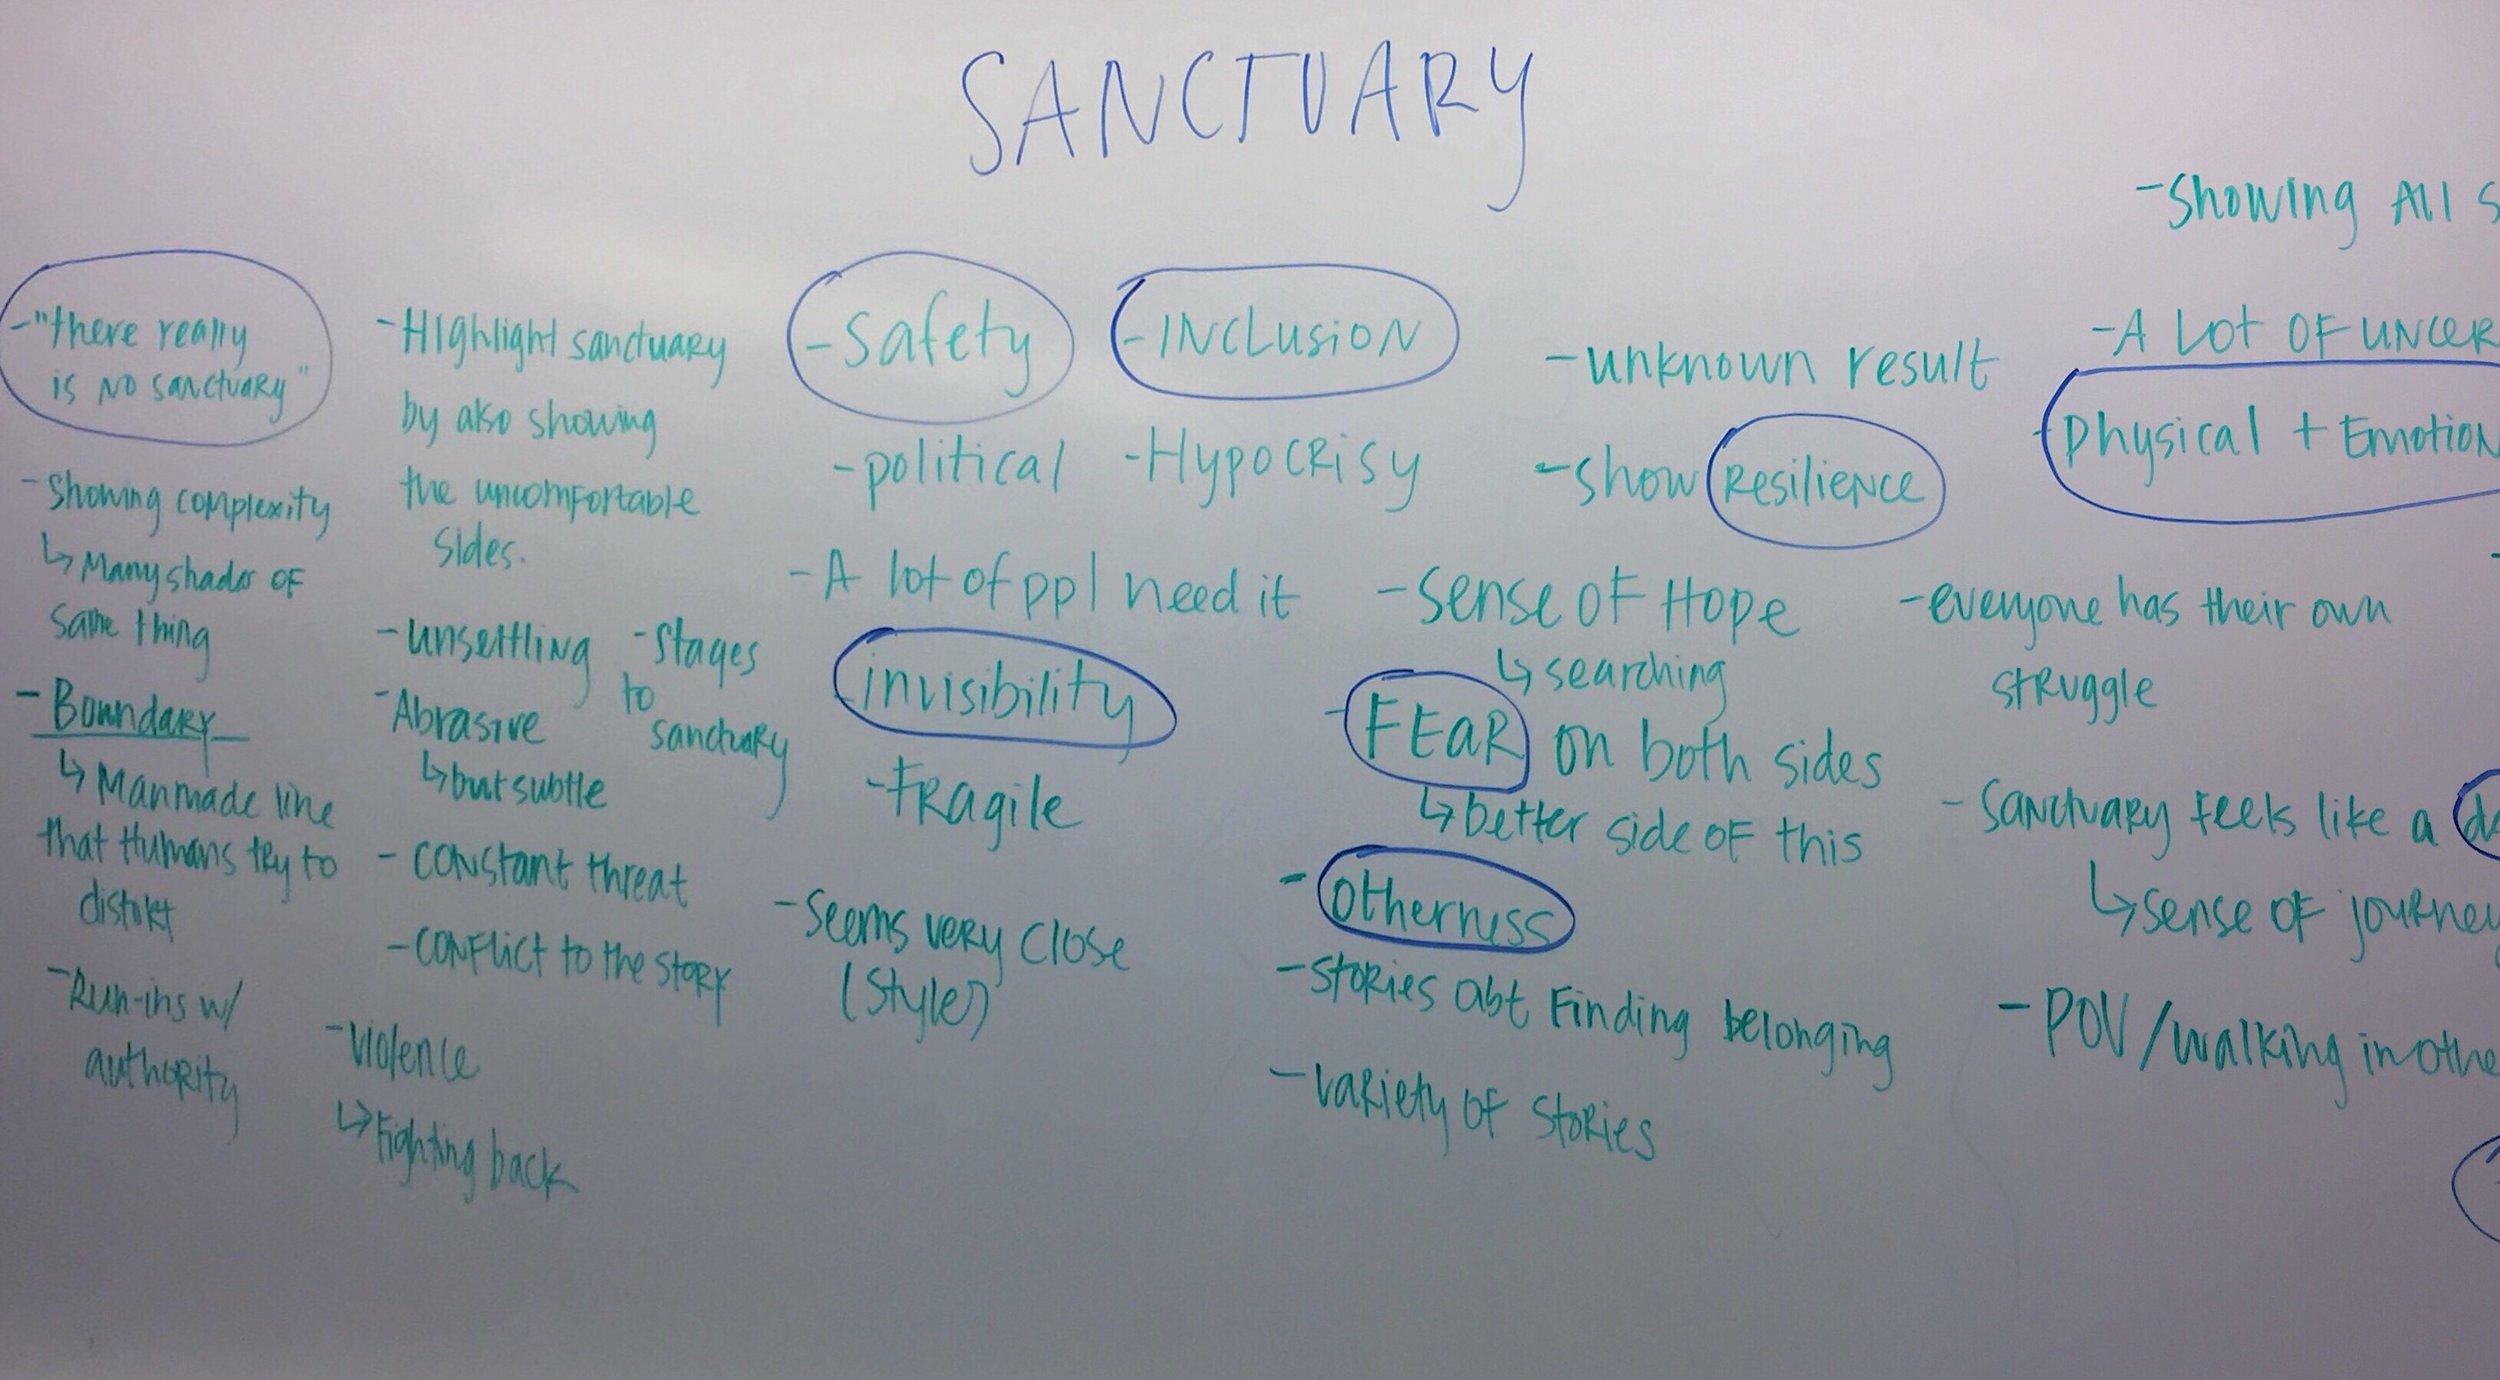 Initial exploration of 'sanctuary' for multimedia website, 'Finding Sanctuary.'